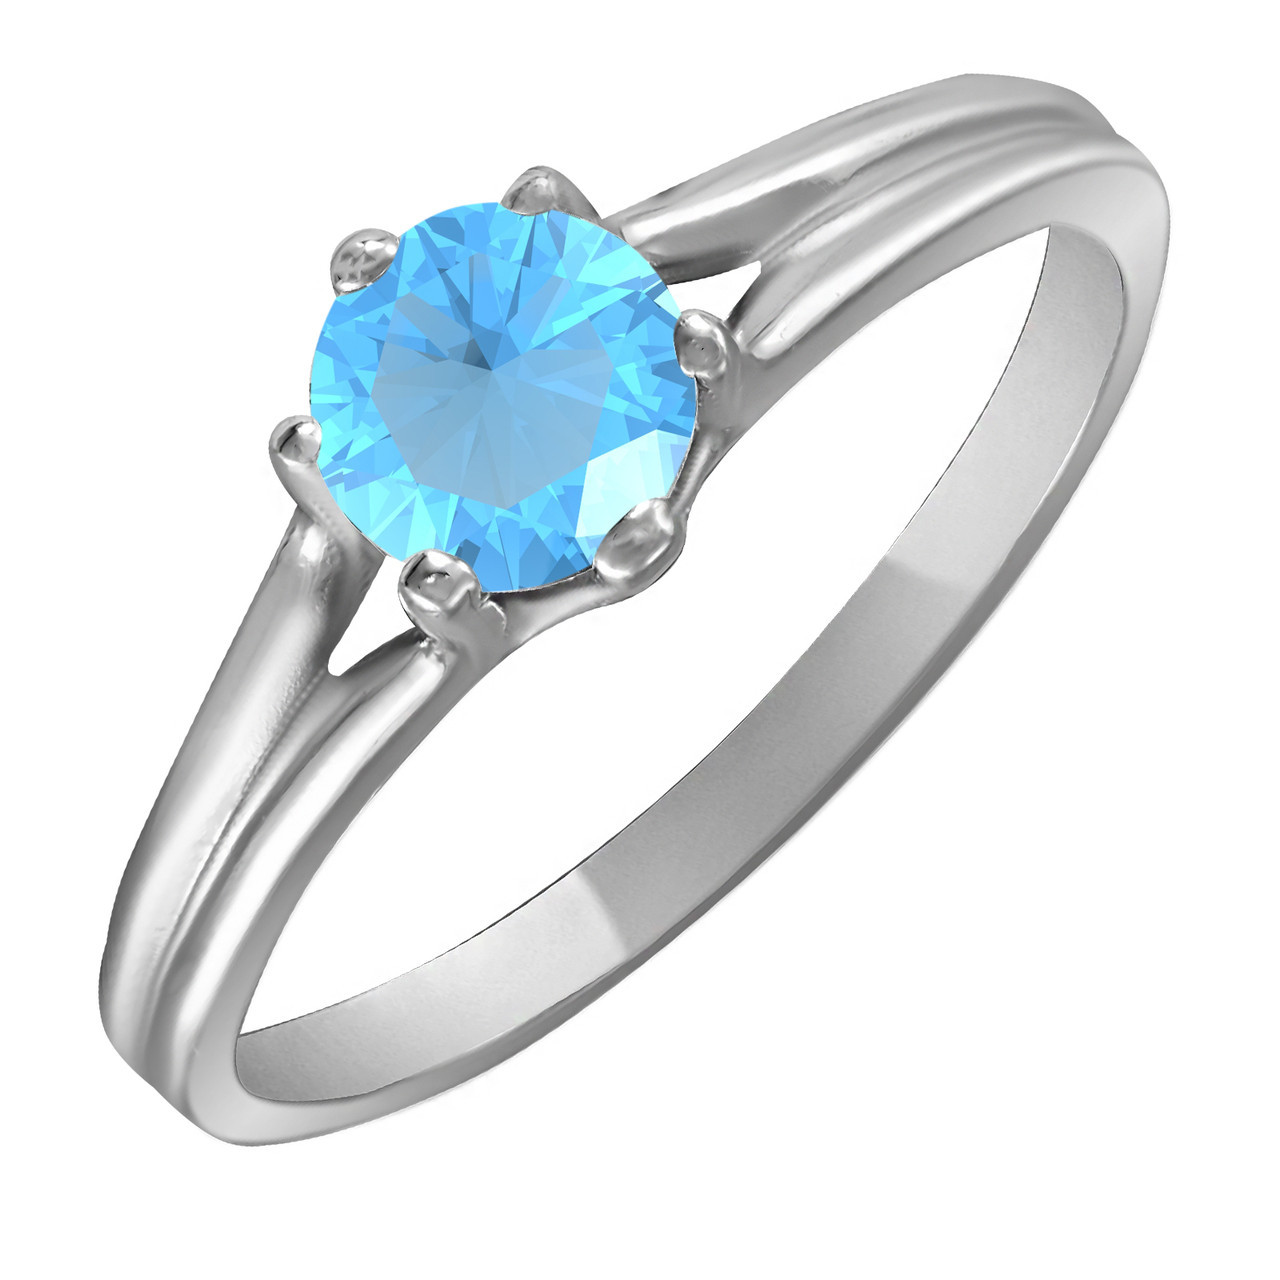 Кольцо из серебра с голубым кубическим цирконием Twiddle Jewelry 19.0 размер (К017г-19.0)